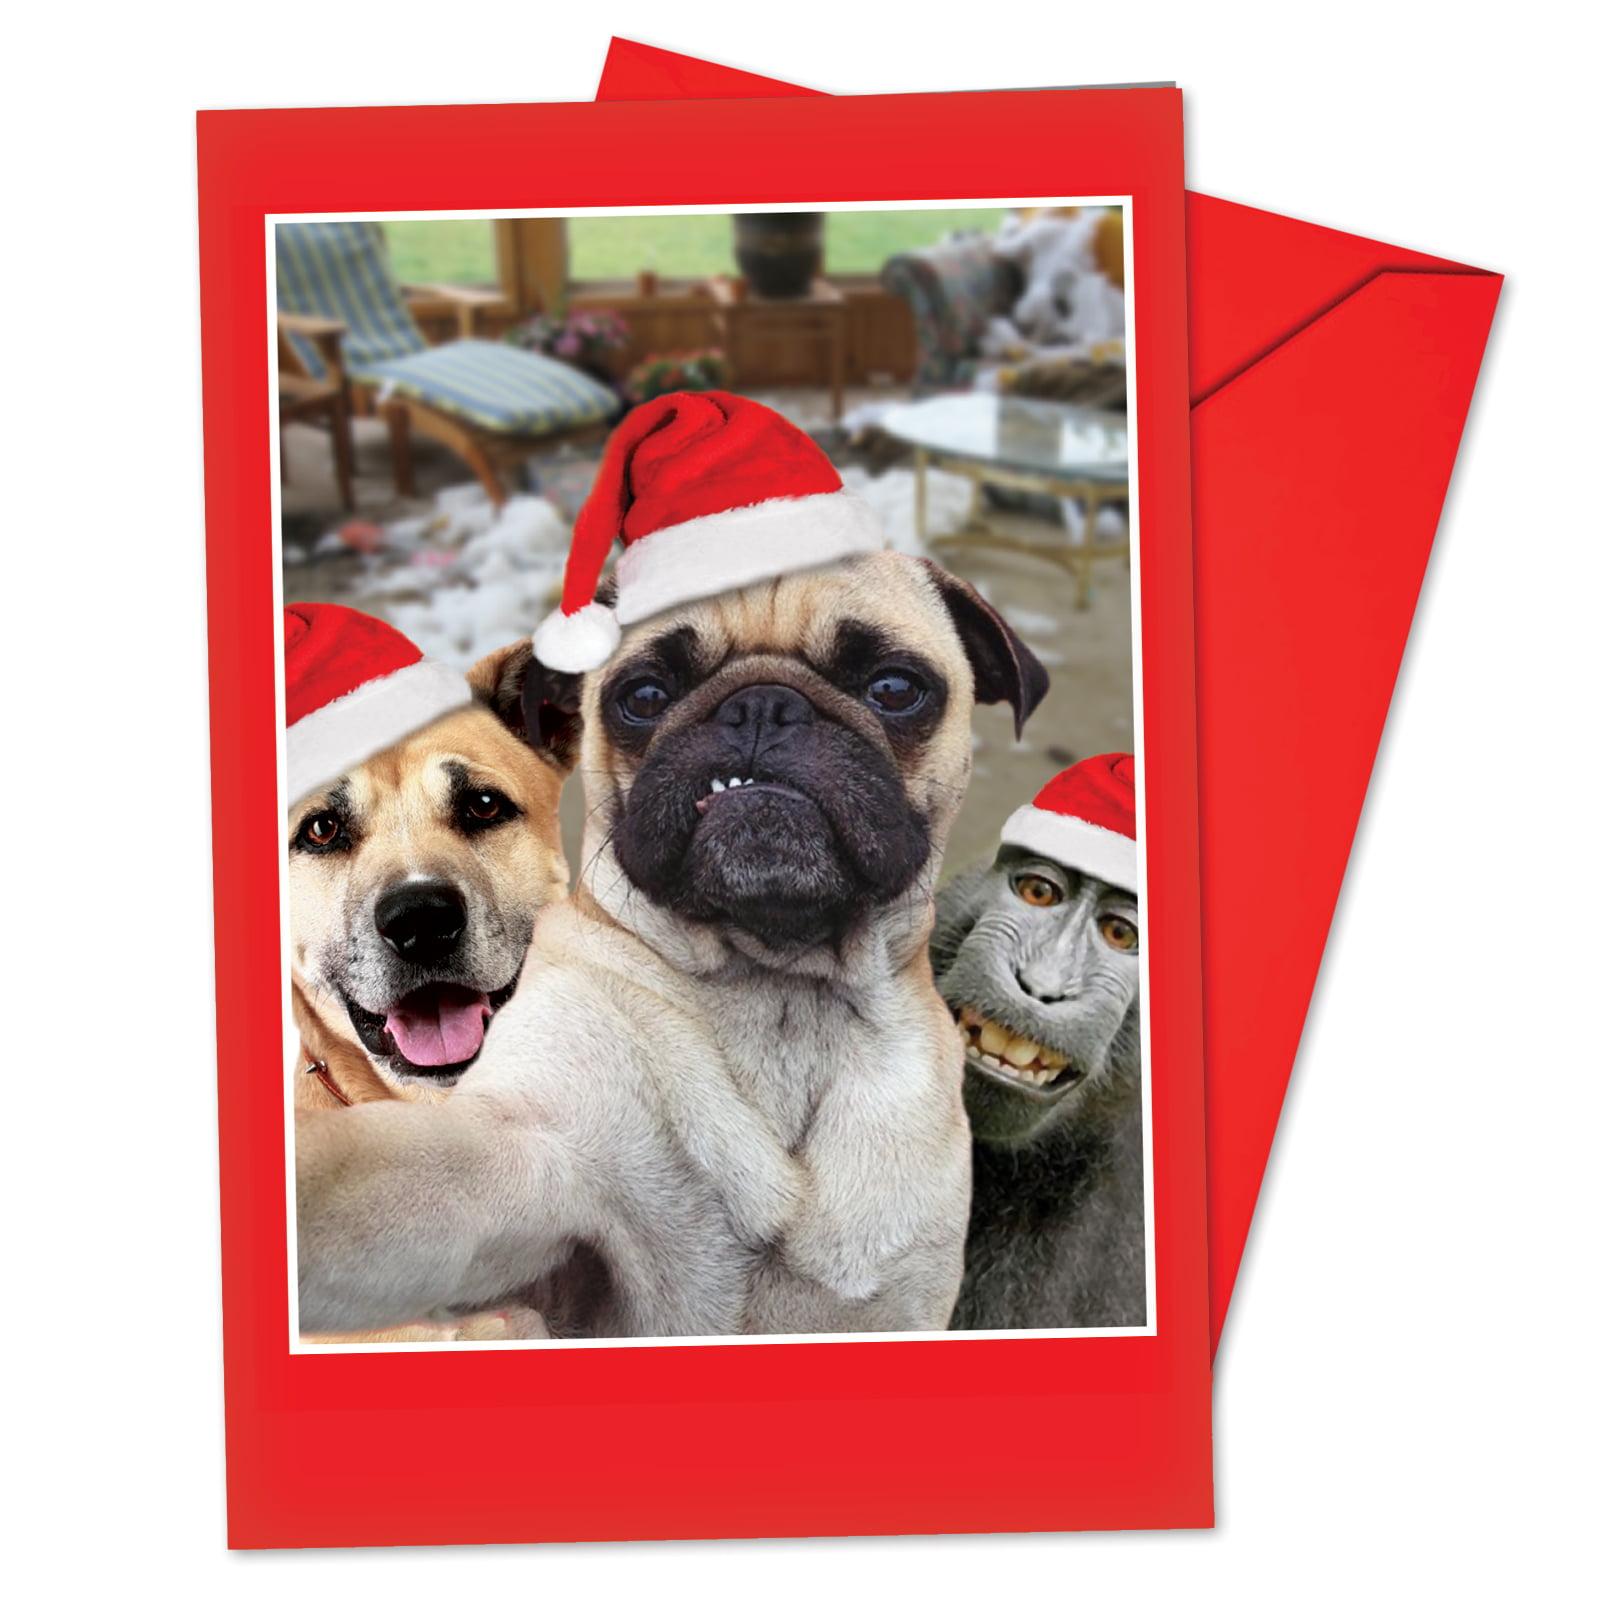 B2373DXSG Box Set of 12 Holiday Animal Selfie Christmas Cards w/ Envelopes, NobleWorks